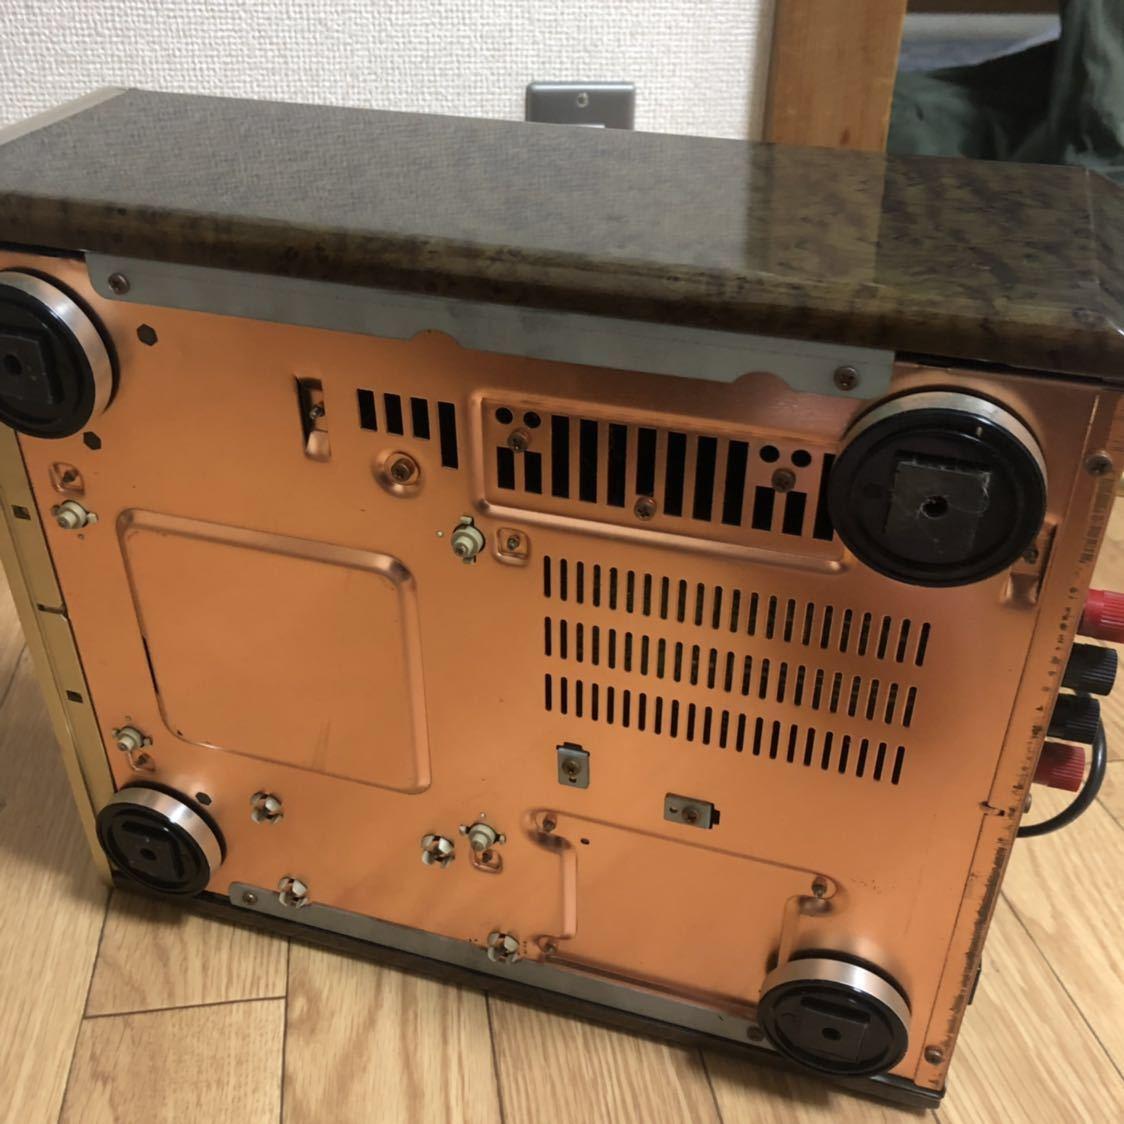 Bose CDレシーバー PLS-1410 ◇ BOSE スピーカー ADVANCED SOUND SYSTEM Model 125 セット_画像6